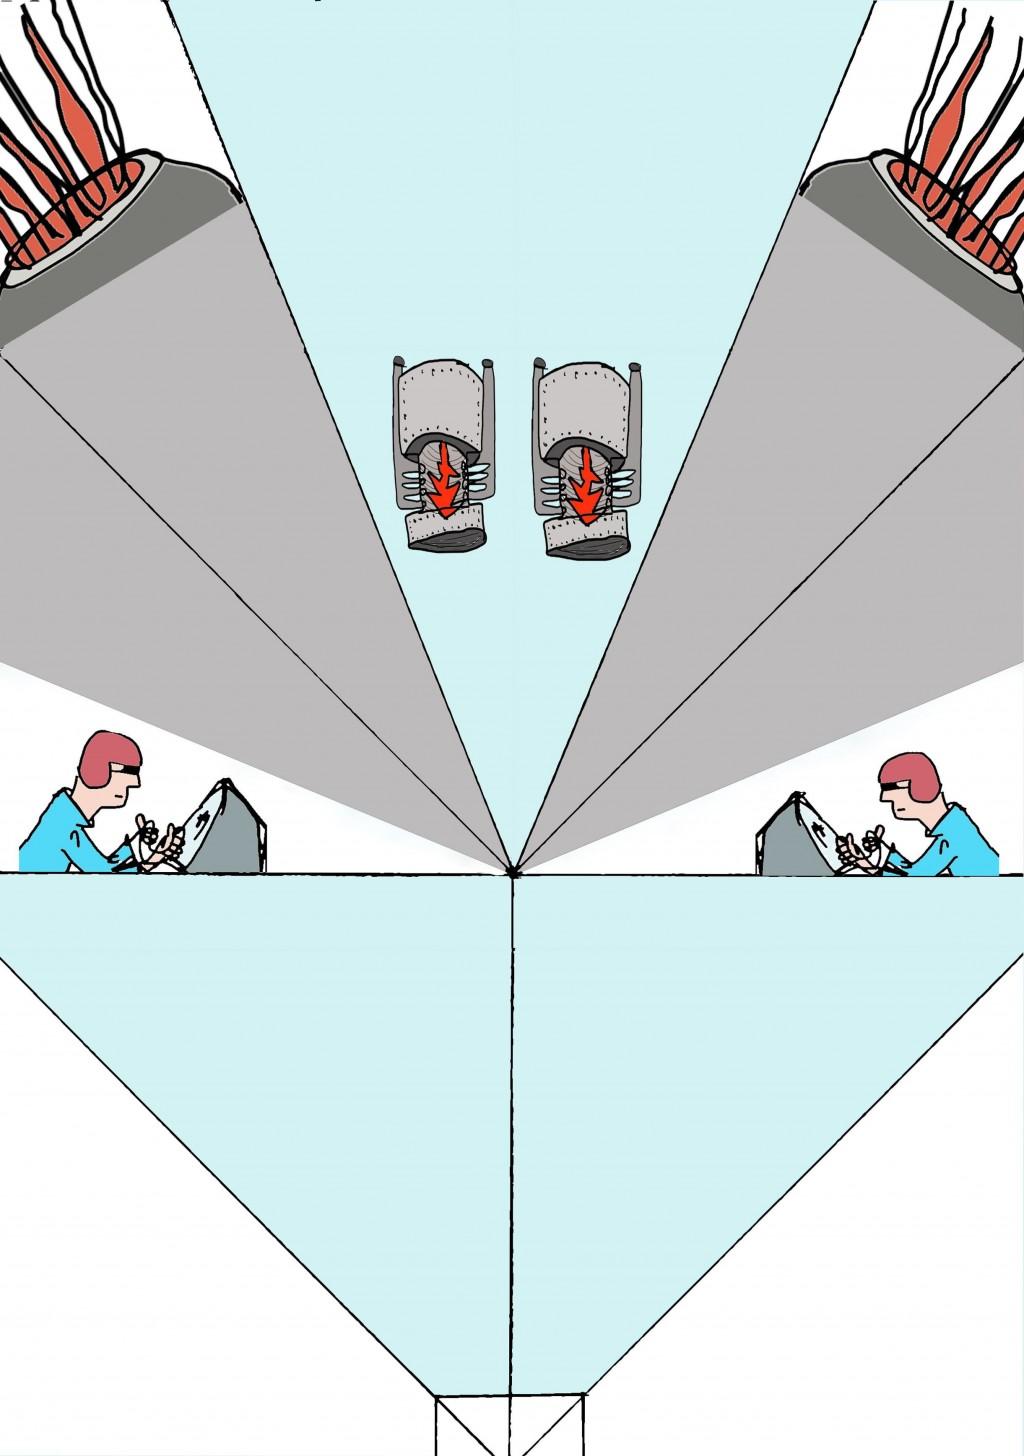 006 Stupendou Printable Paper Airplane Folding Instruction Sample Large